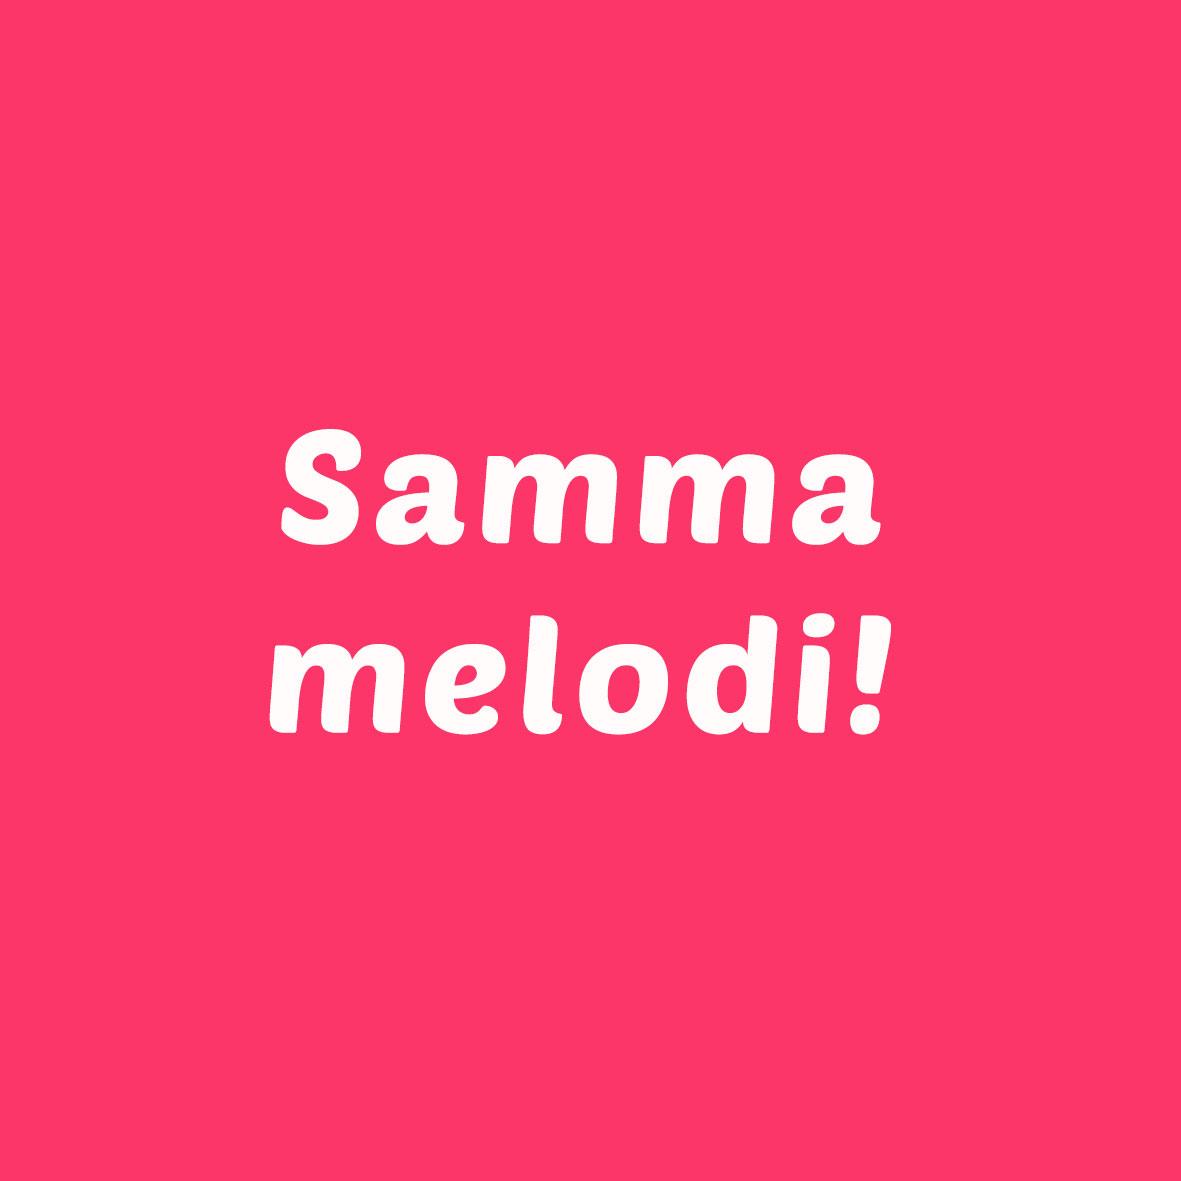 SAMMA-MELODI-KVADRAT.jpg